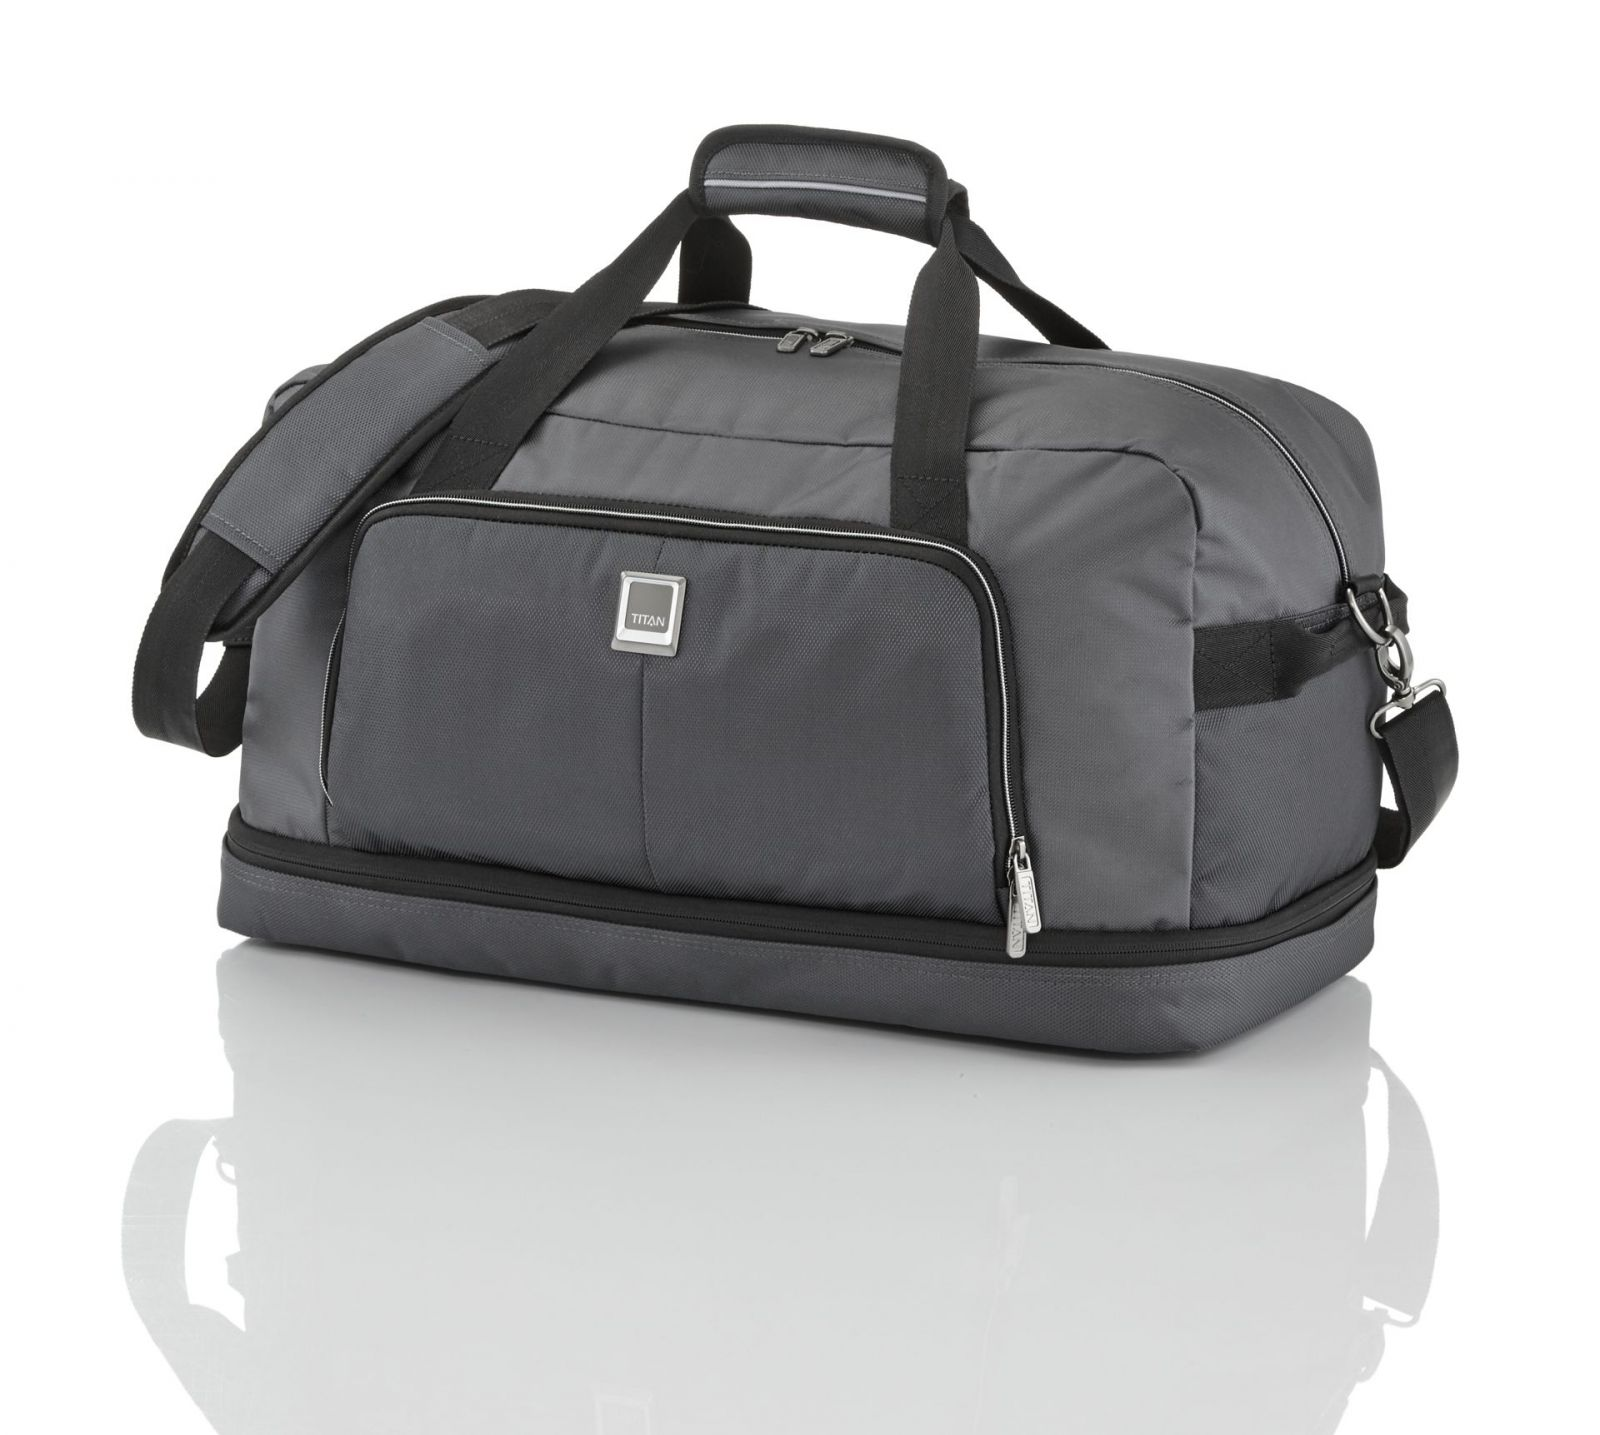 Titan Nonstop Travel Bag Anthracite